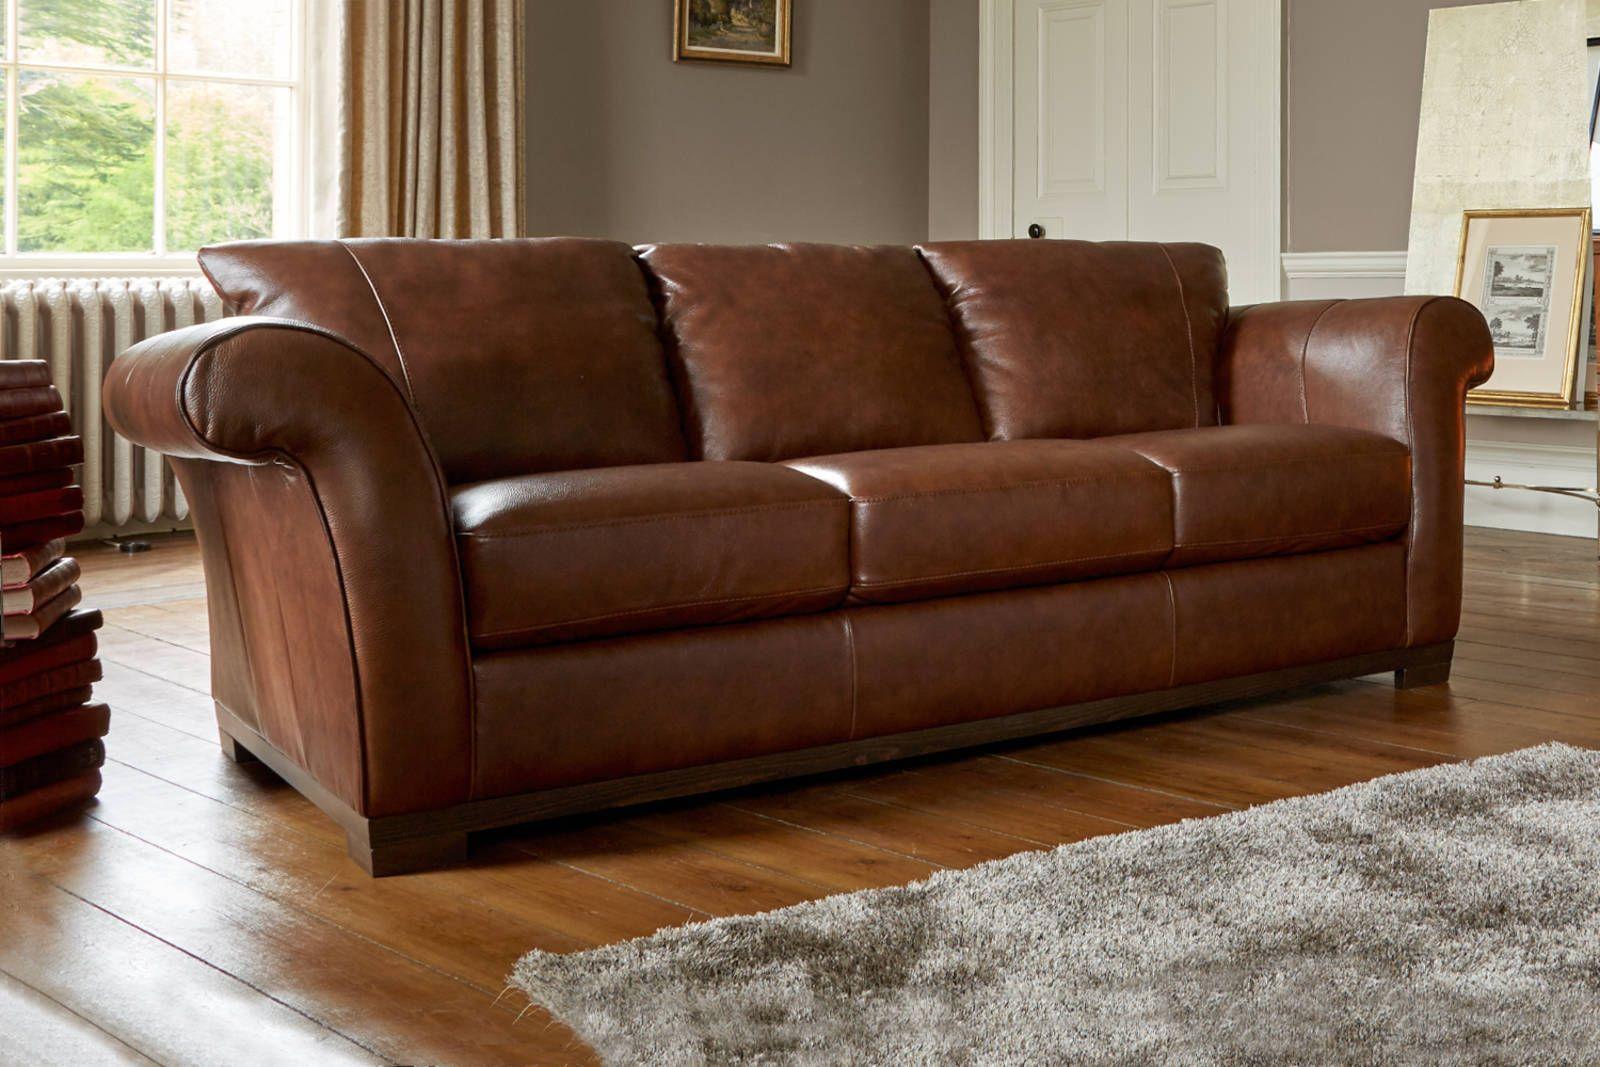 Carmelo Sofology 899 Leather Sofa Home Sofas